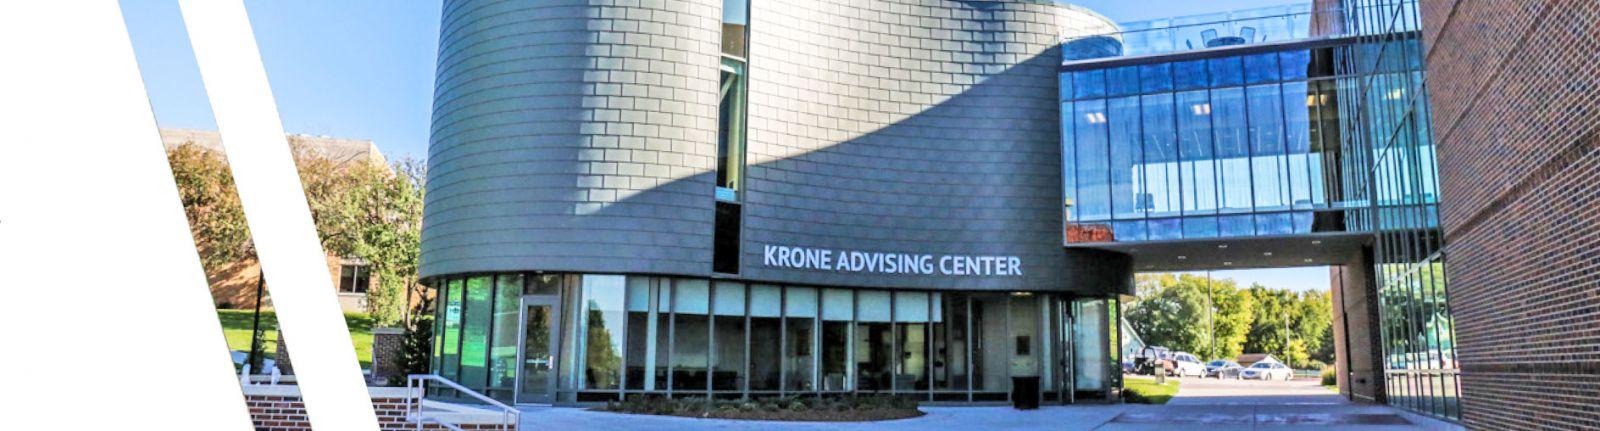 Krone Advising Center